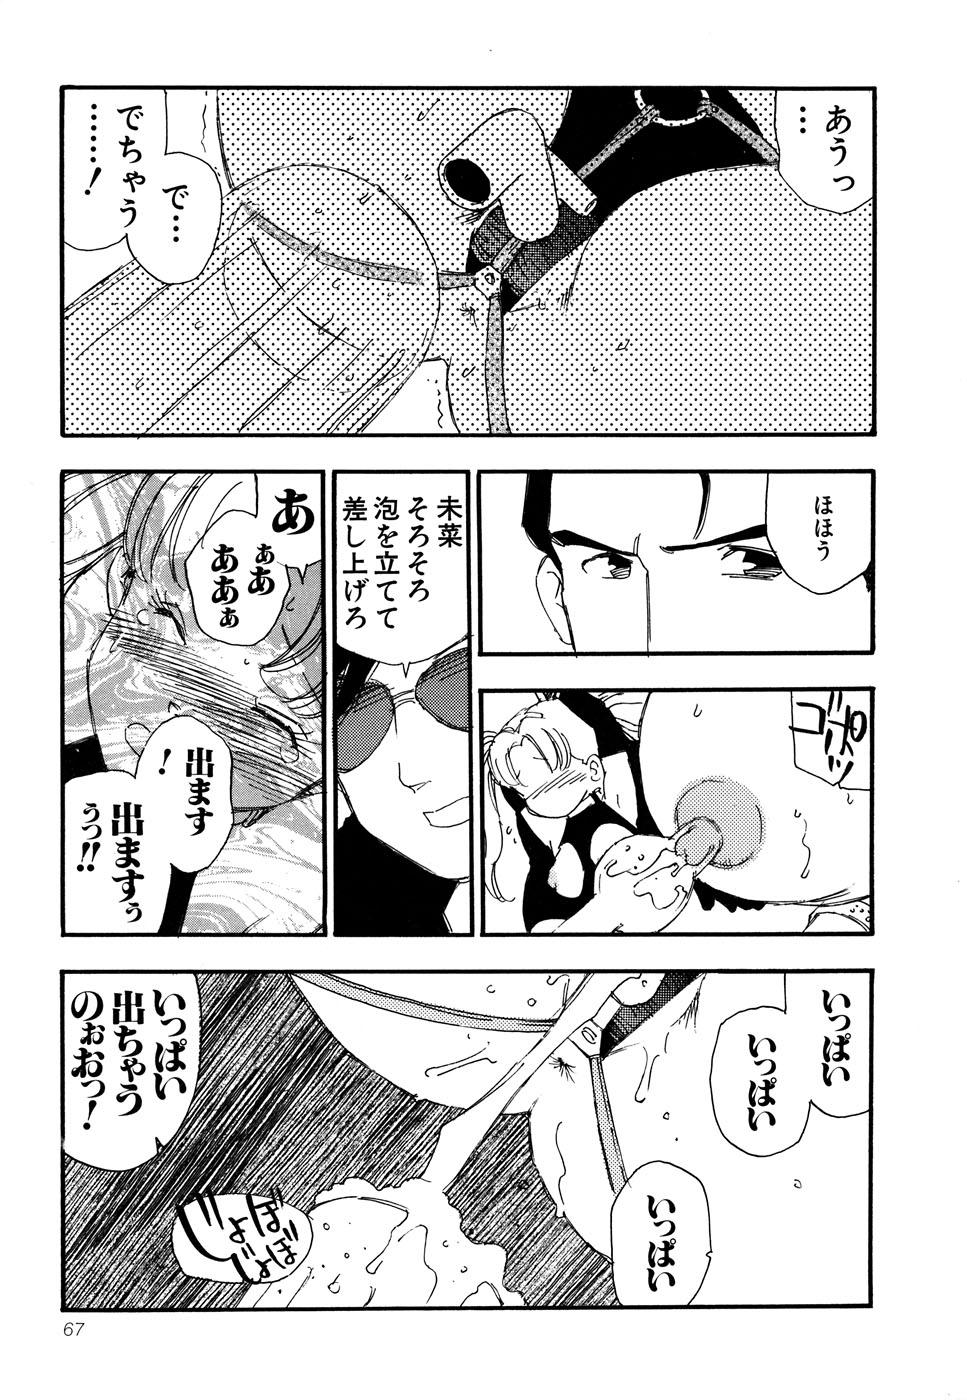 G-drive Vol.1 Ryoujokuhen 66